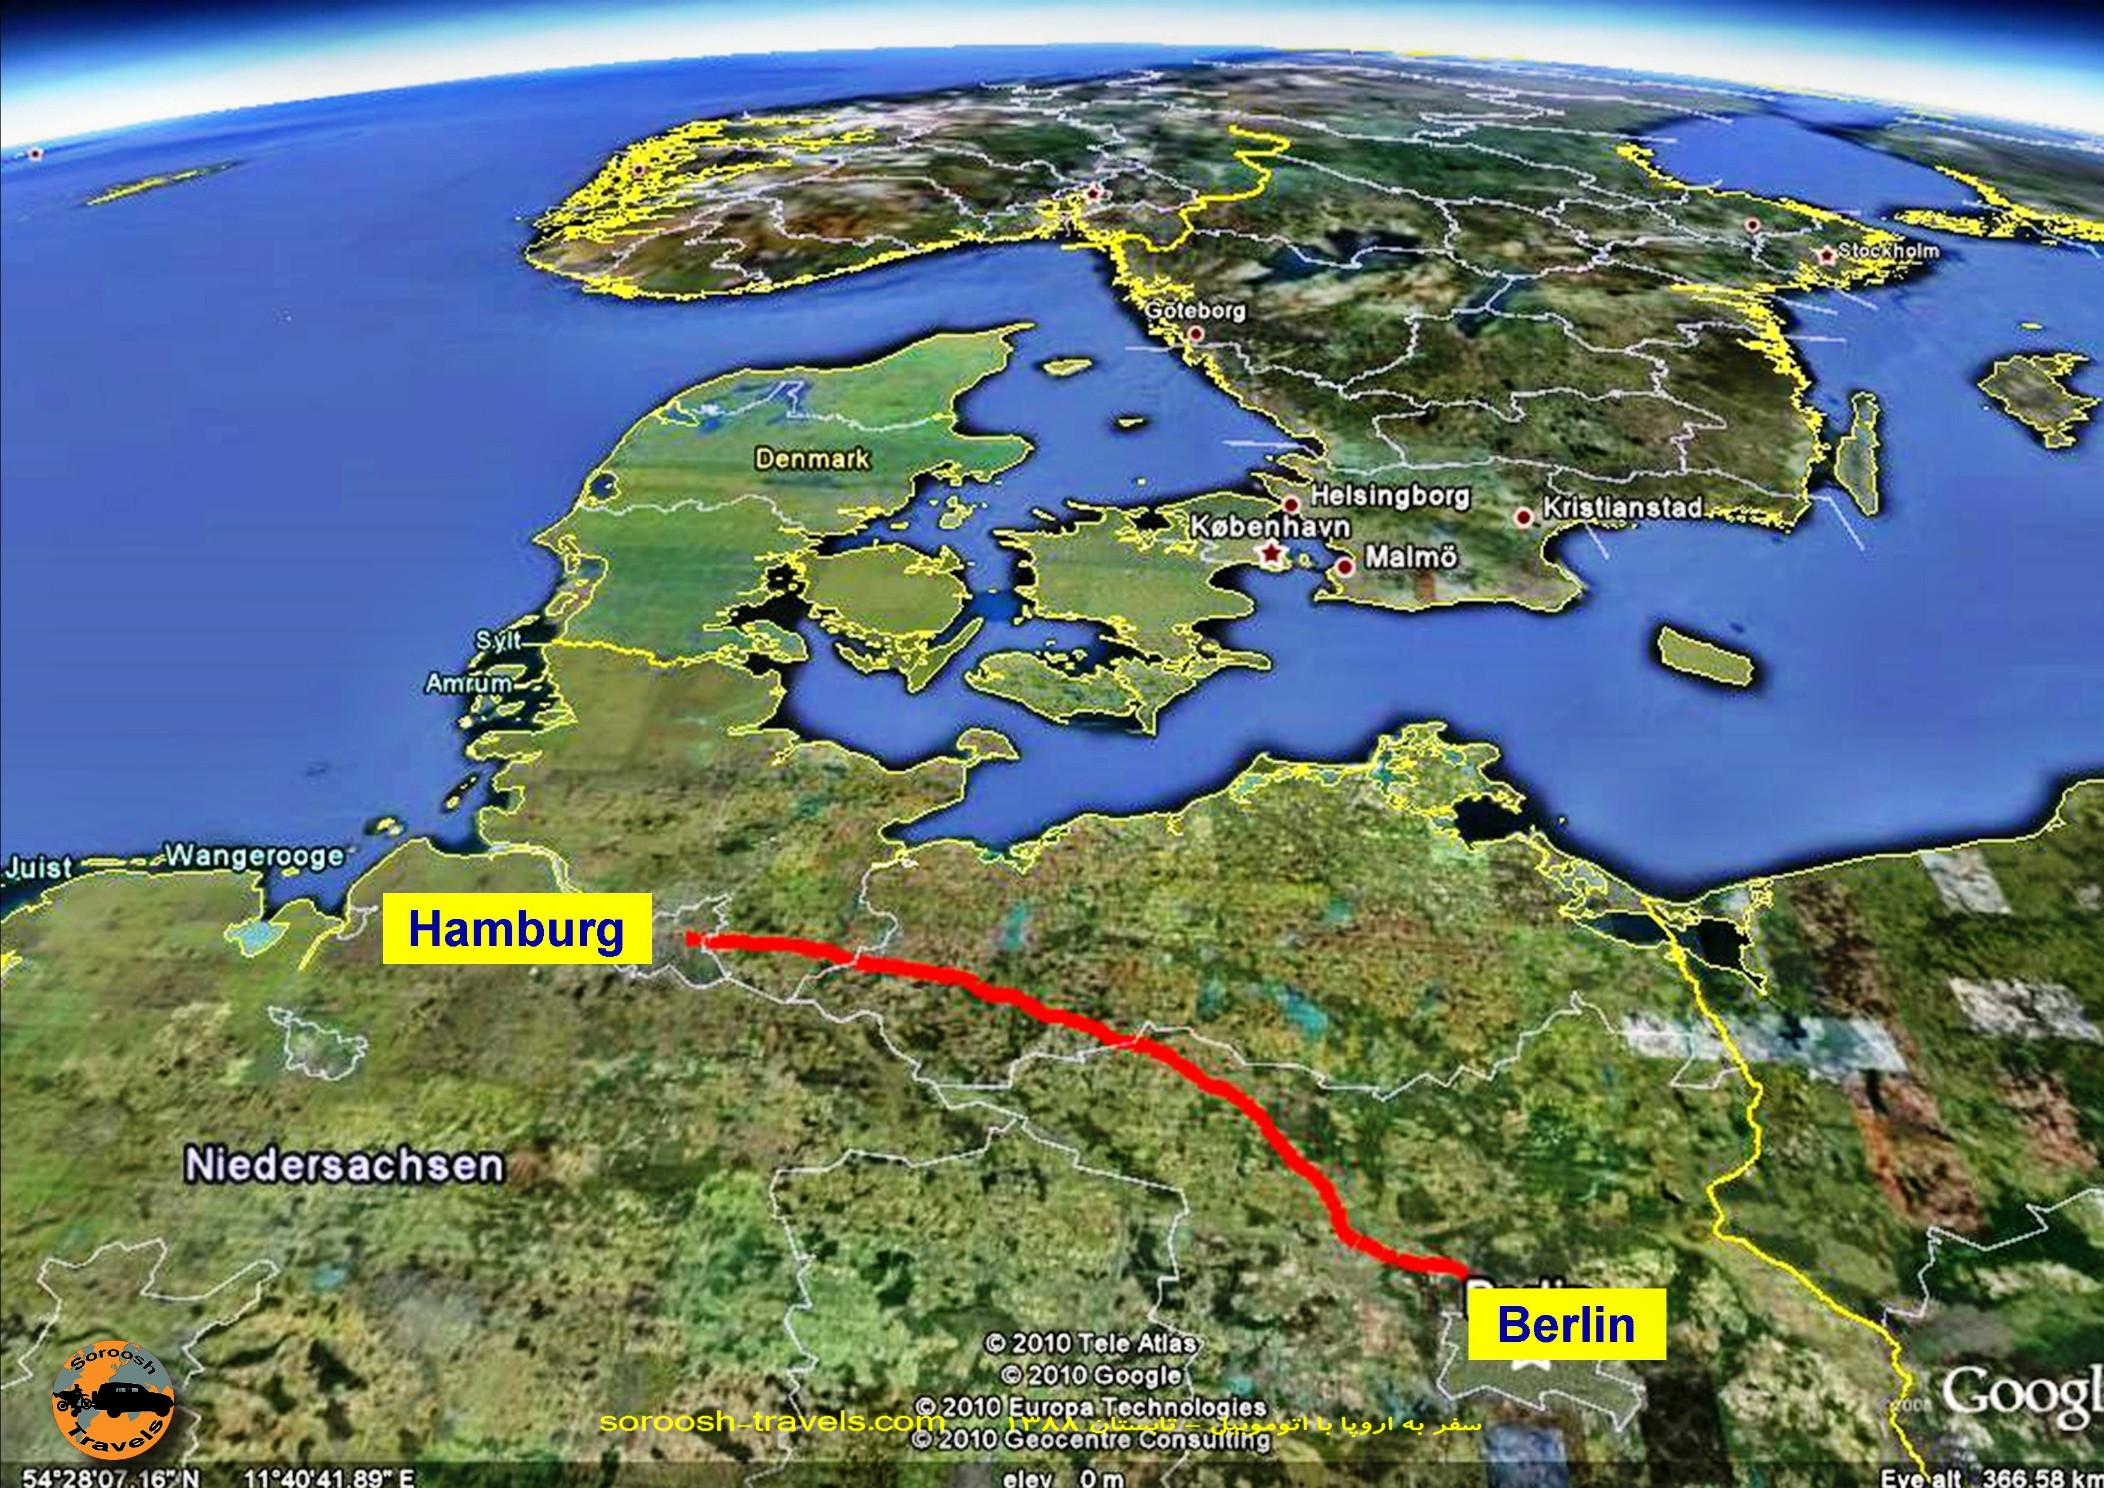 47-27-shahrivar-18-september-hamburg-to-berlin-19